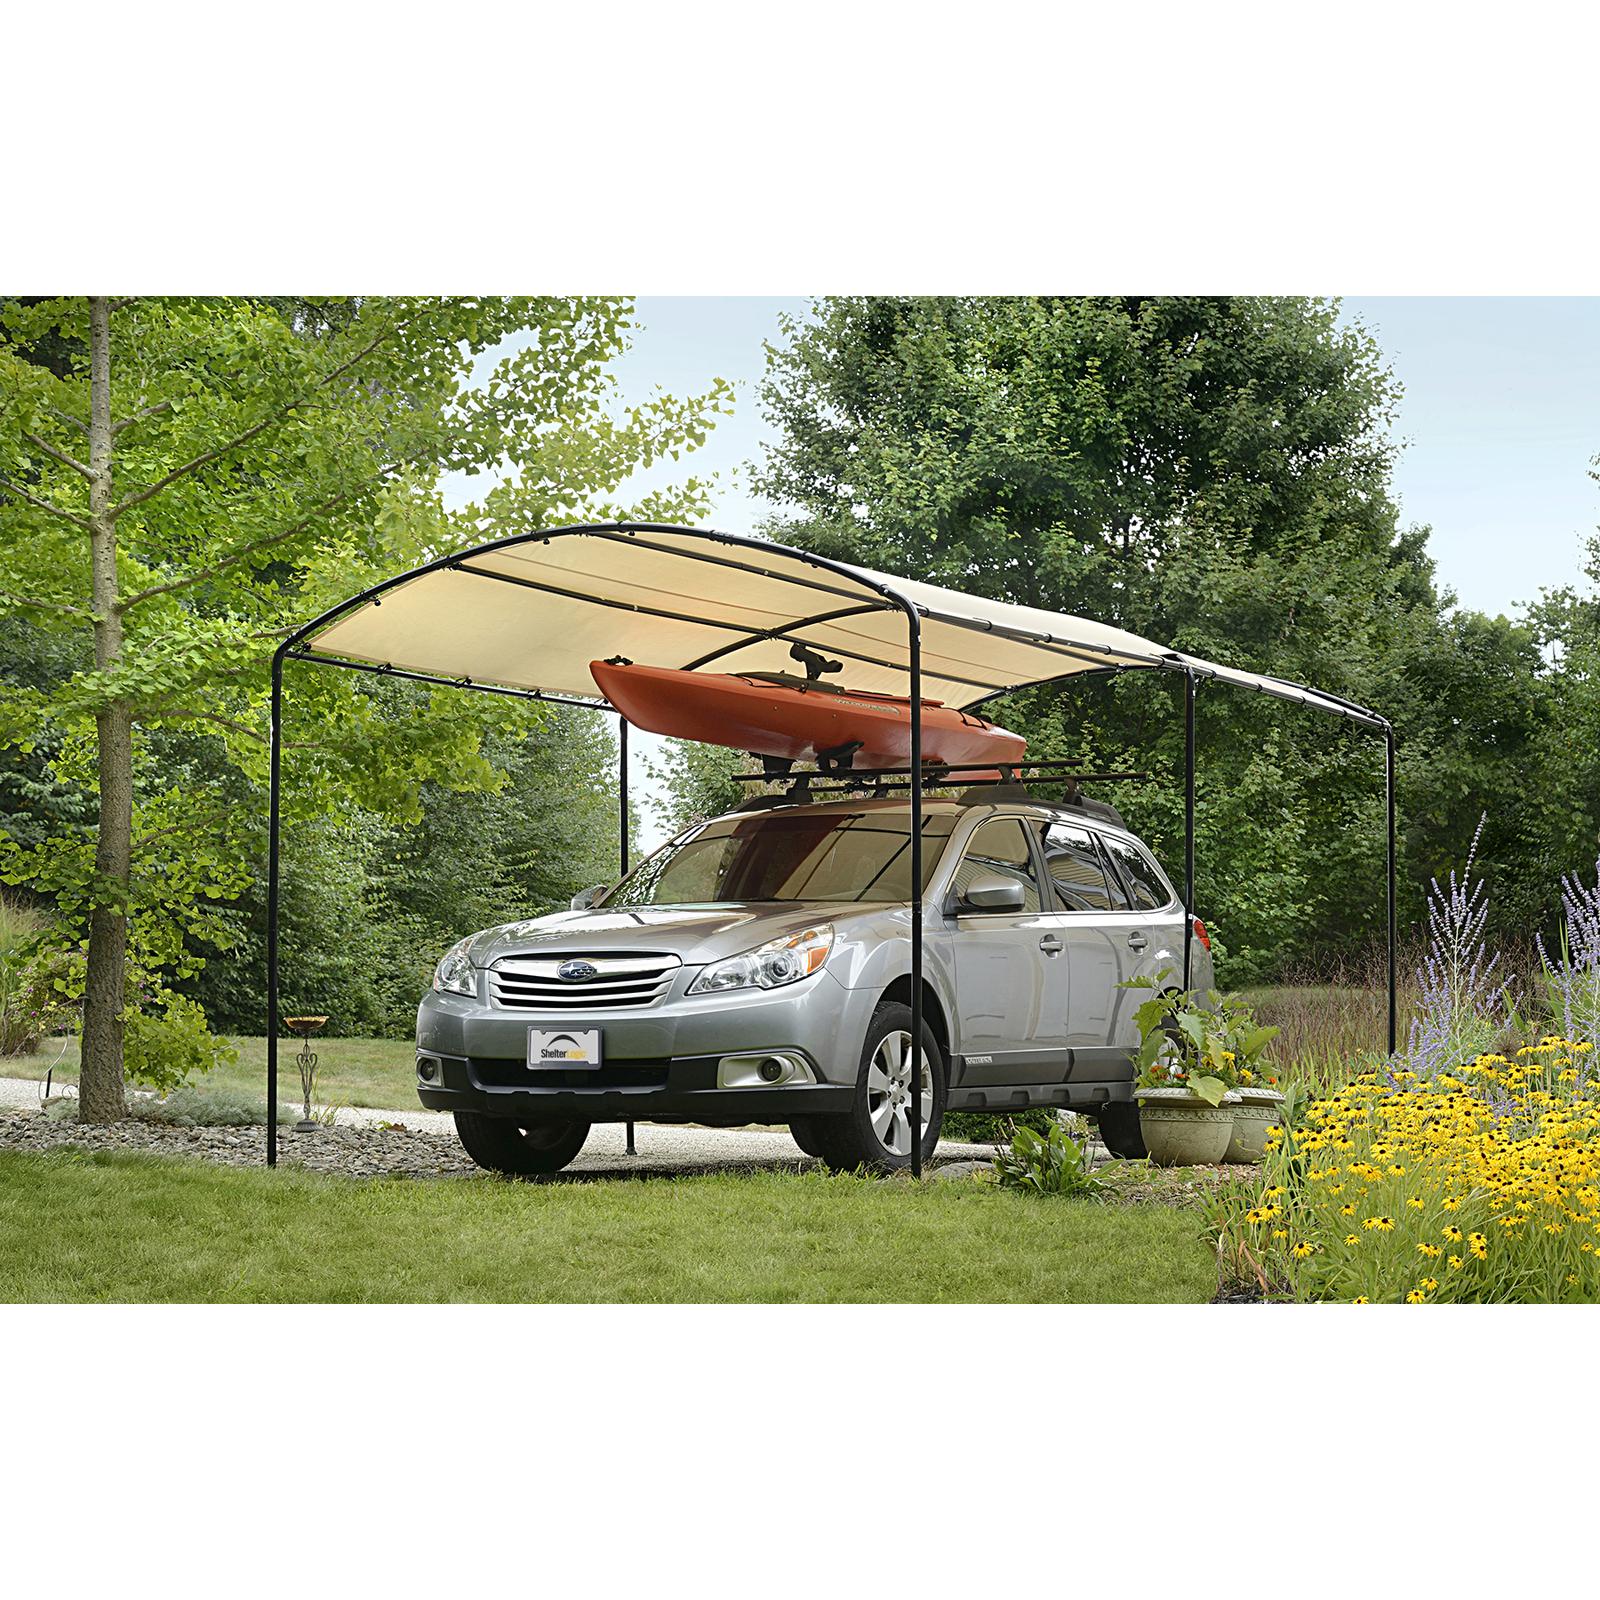 shelterlogic monarc car canopy ZNADMOH